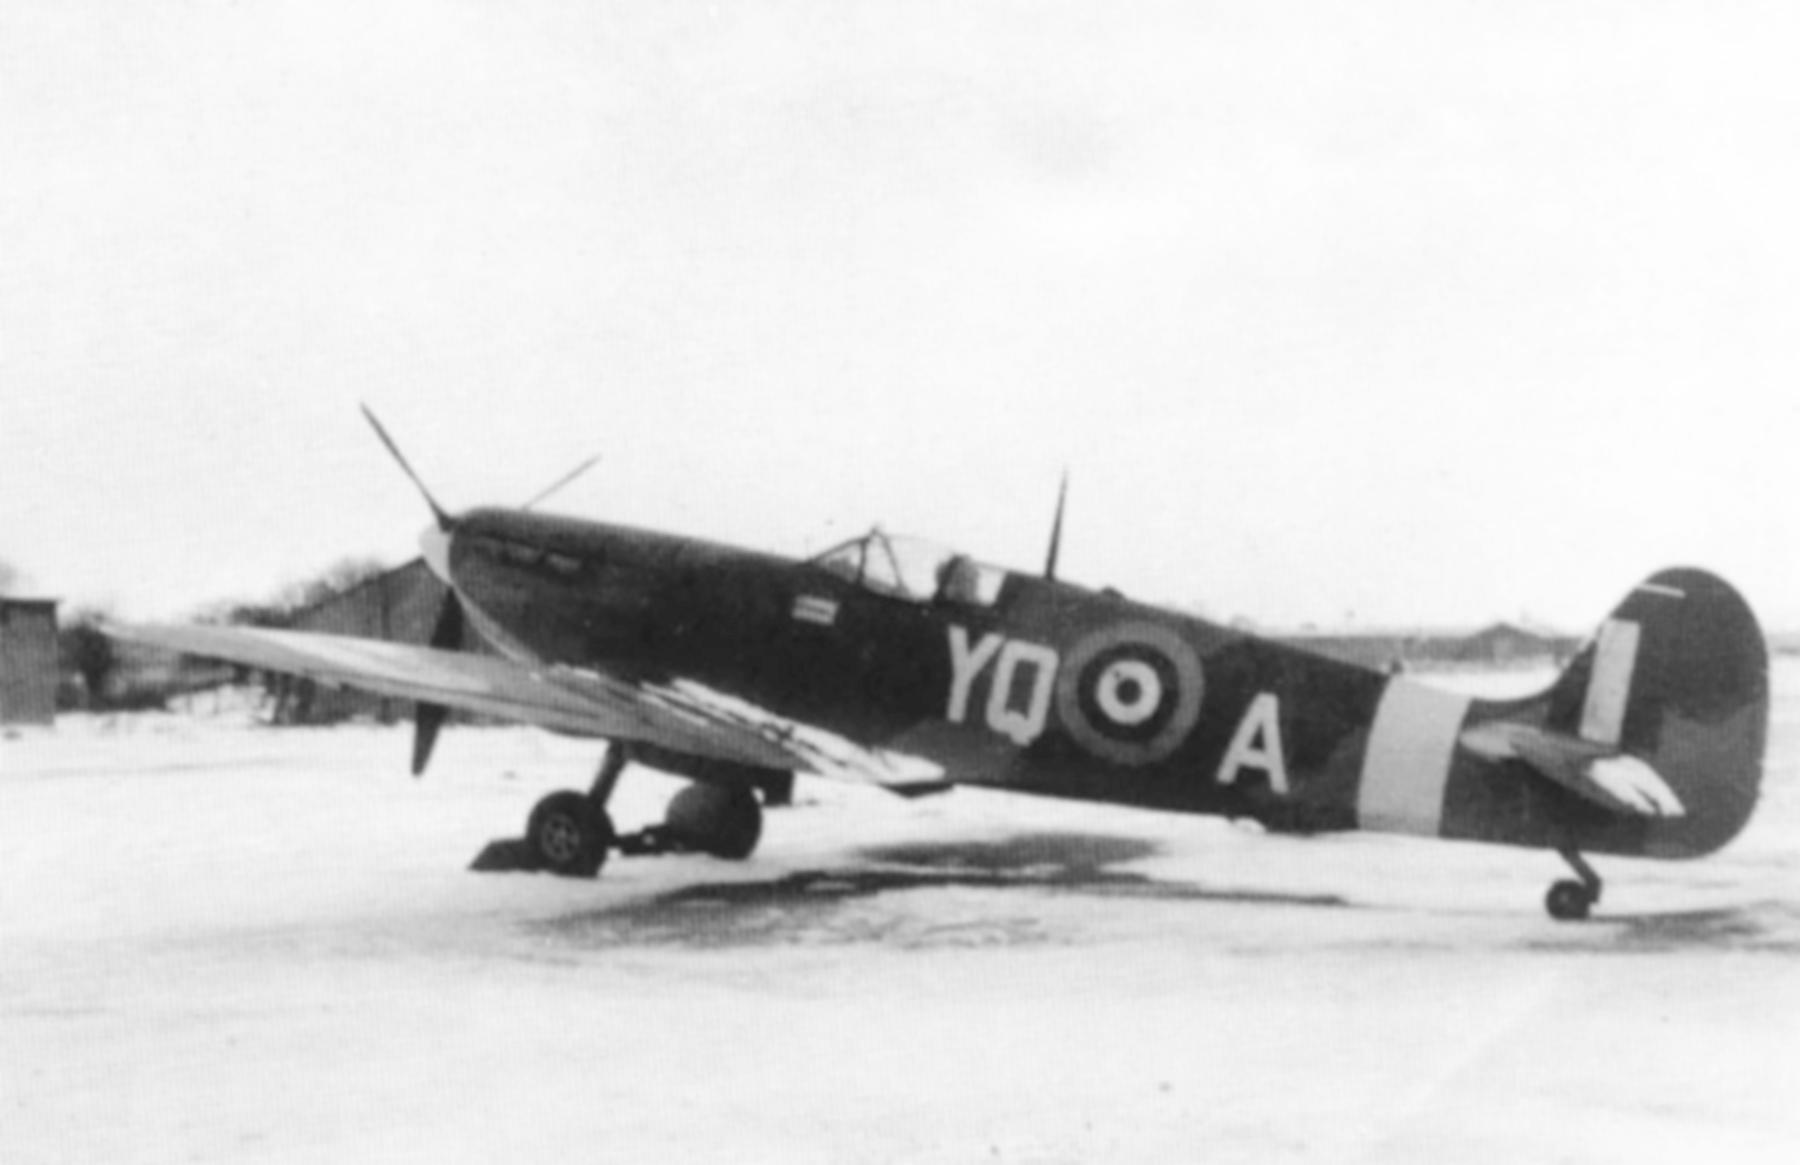 Spitfire MkVb RAF 616Sqn YQA Colin Falkland Gray Kings Cliff Jan 1942 01